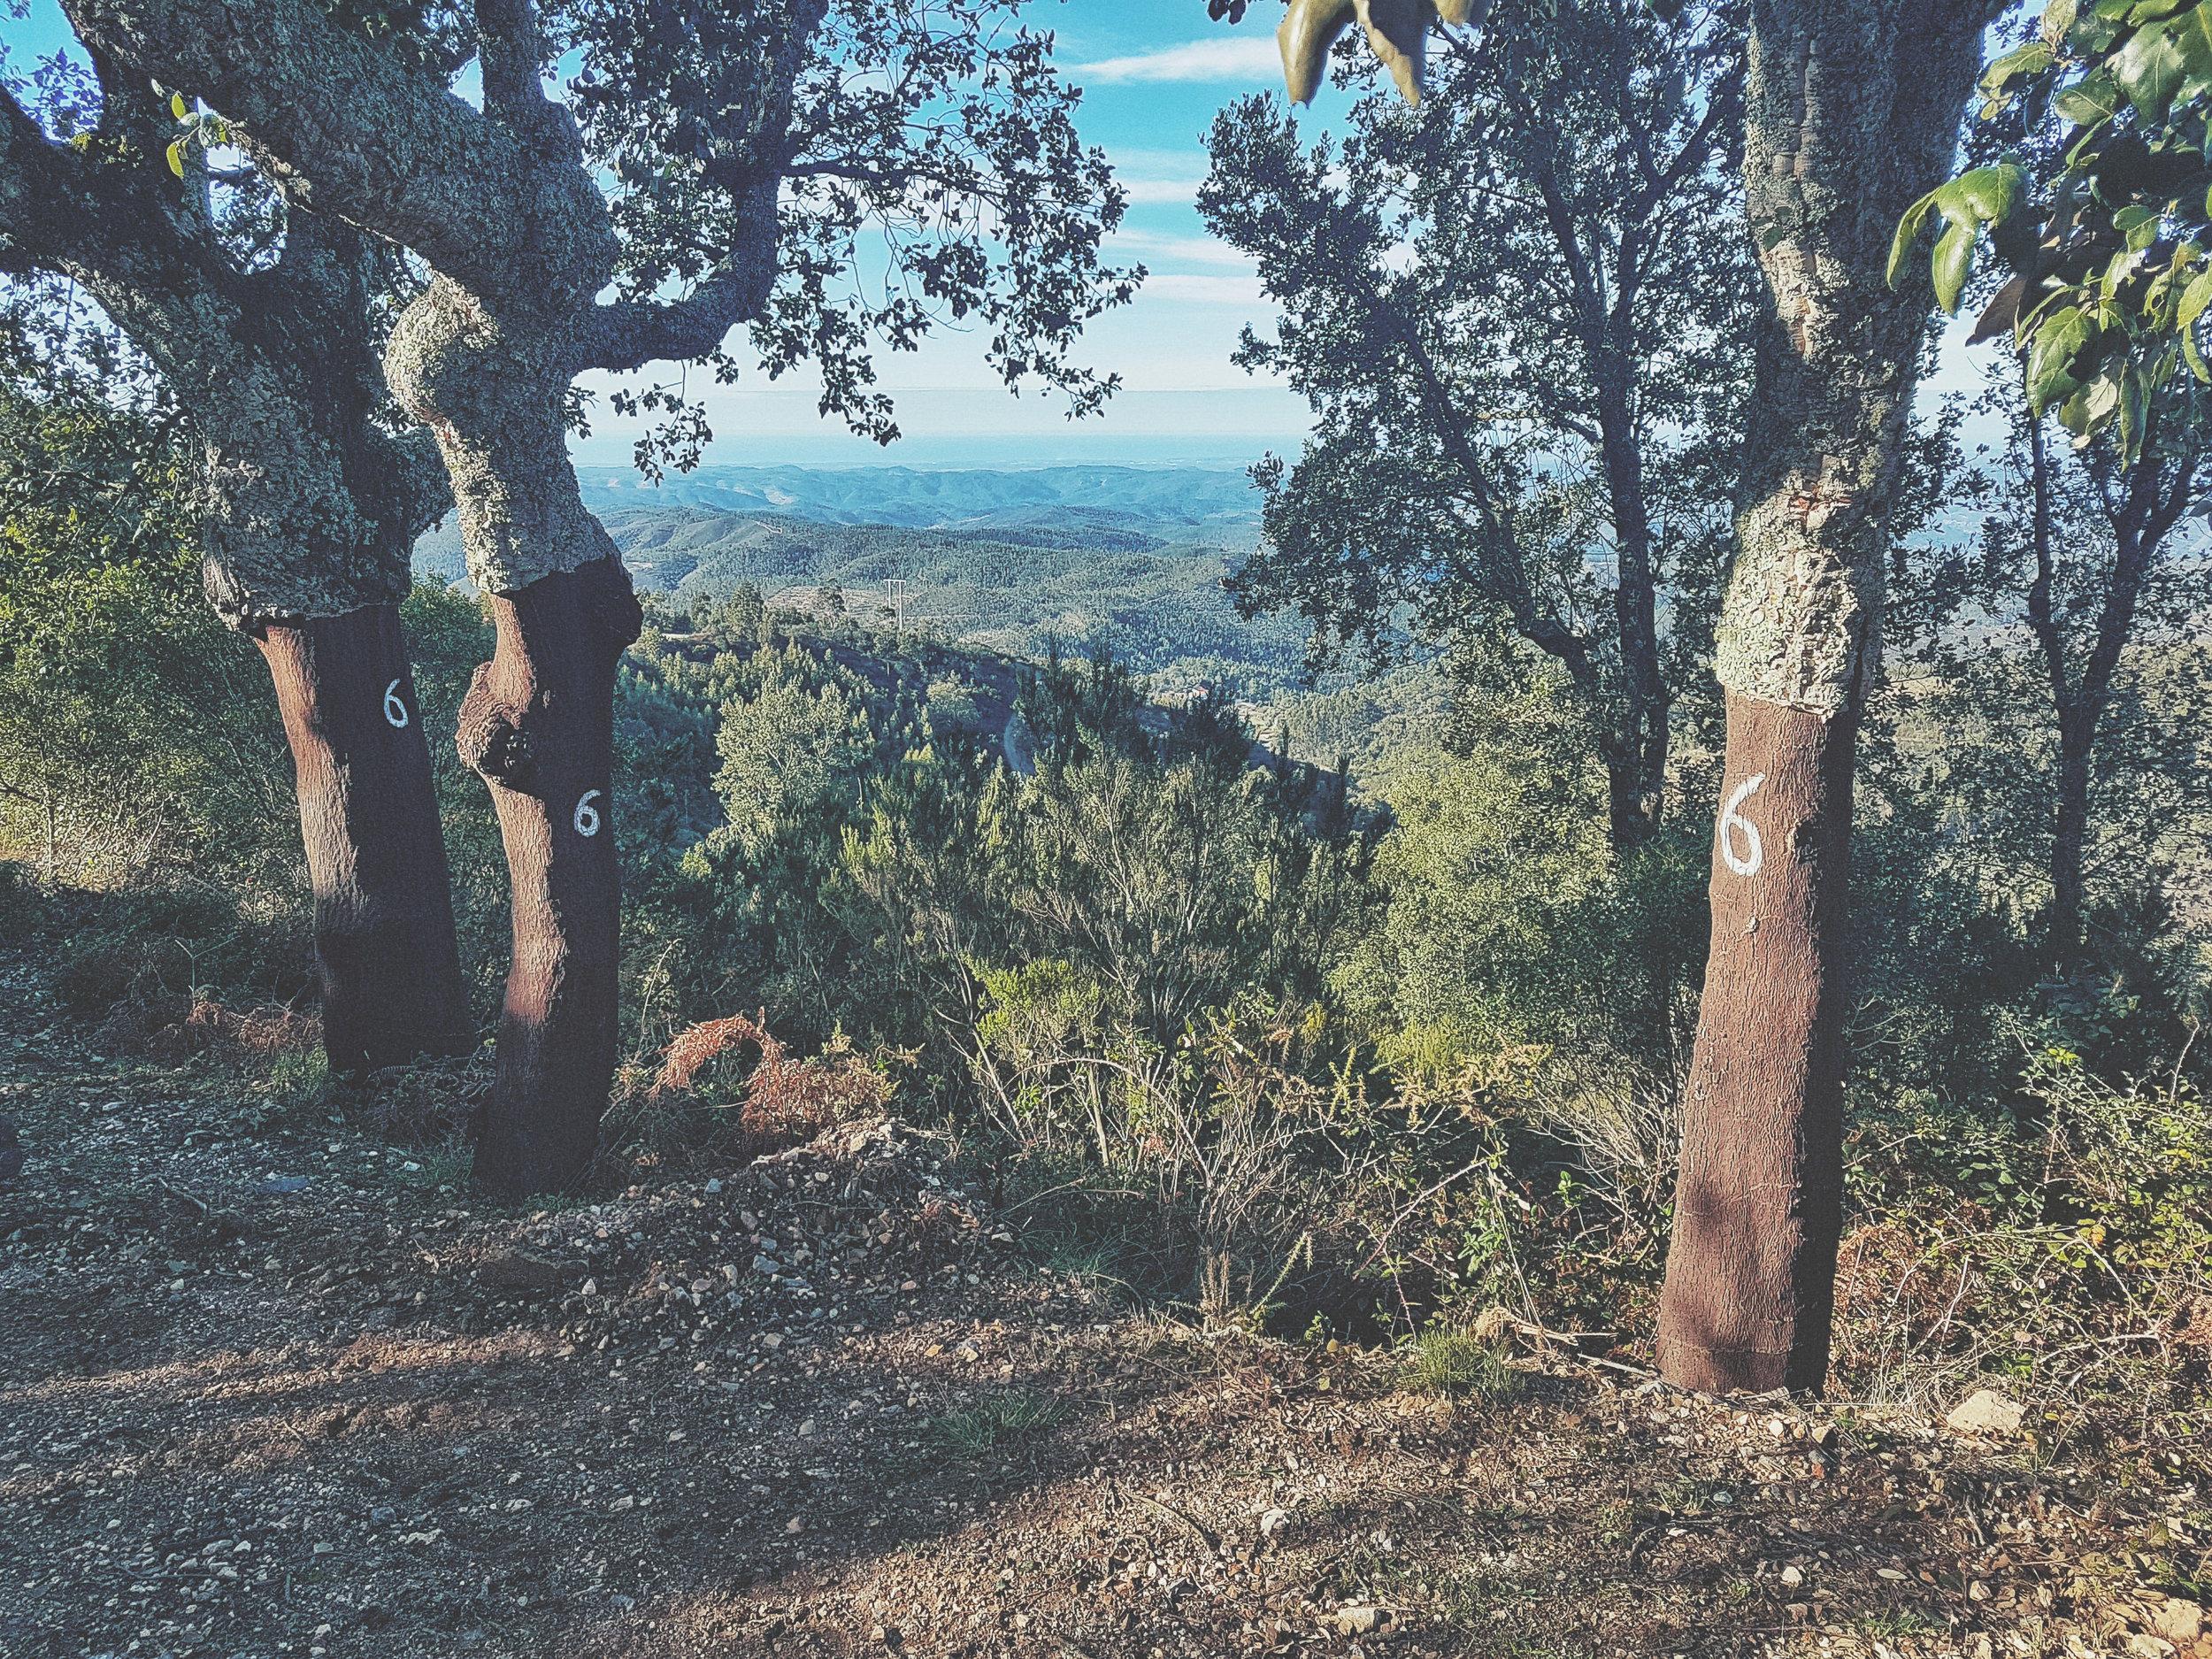 barbelote waterfall monchique portugal. hiking trail. walking trail. evil trees. lots of trees. cork trees..jpg